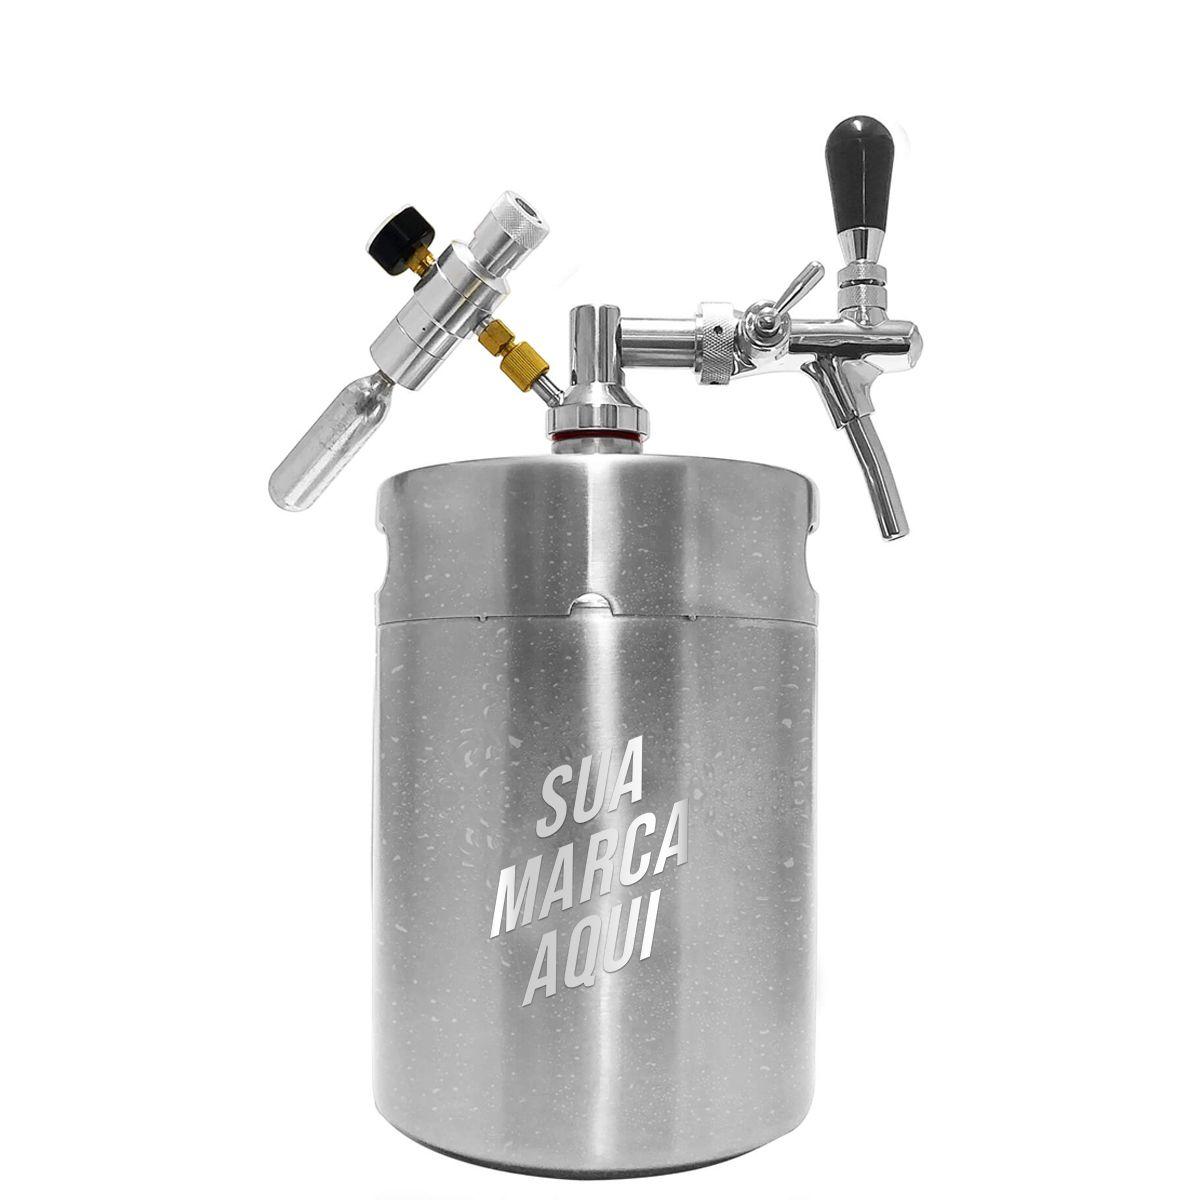 Kit my keg personalizado em laser